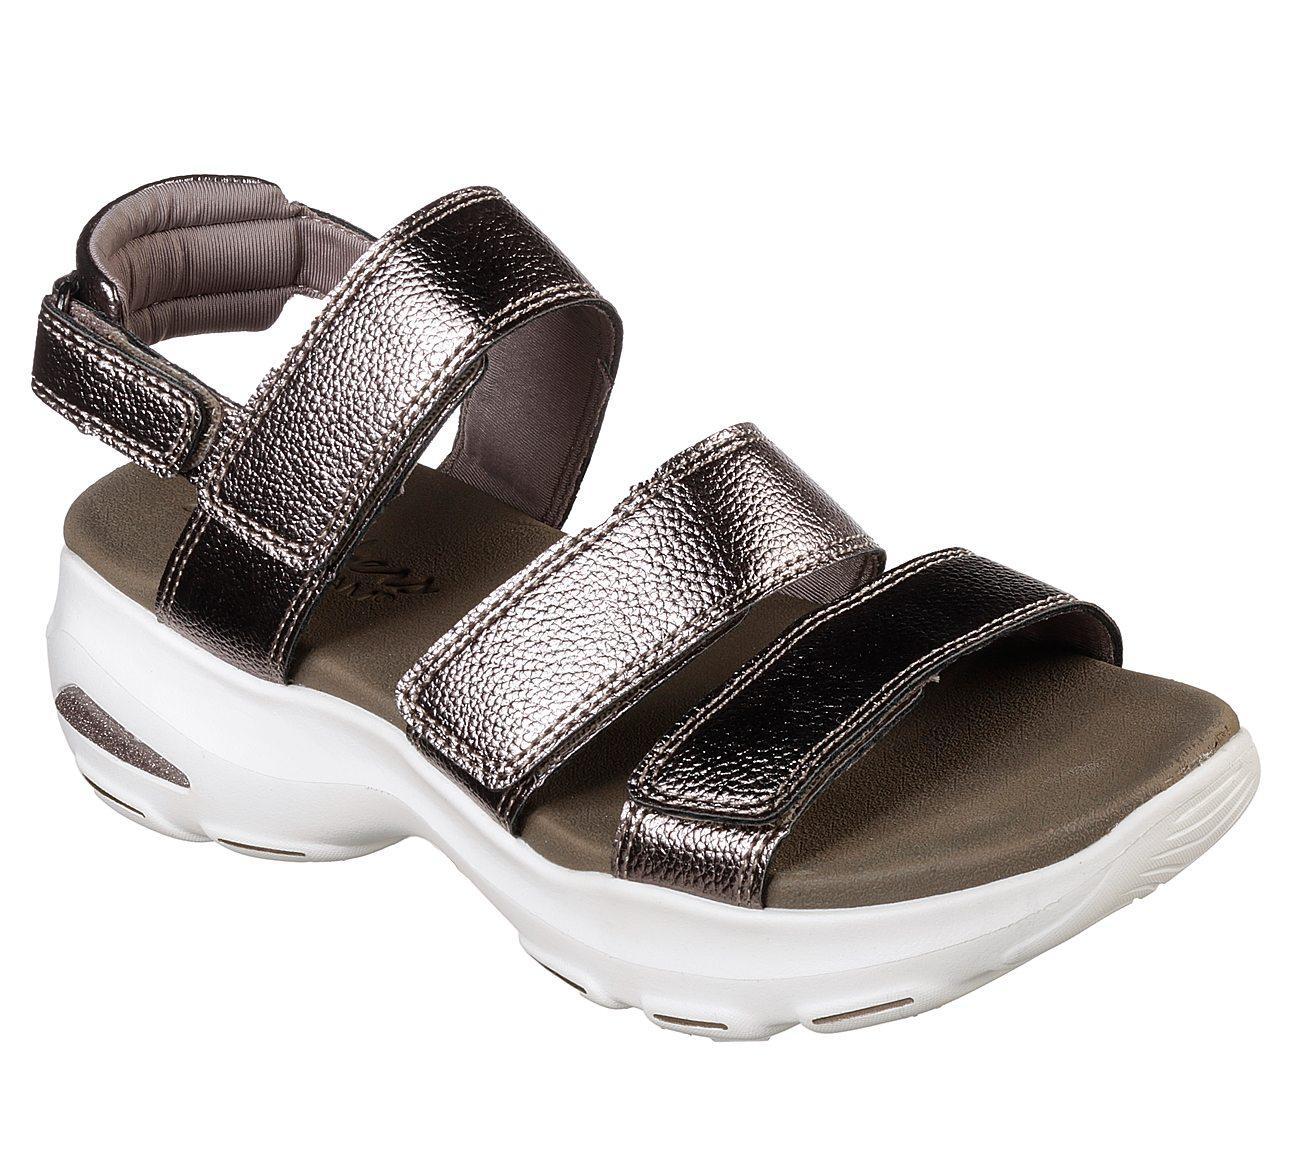 Skechers - D'Lites Ultra - Fab Life Sepatu Kasual Sport Wanita - Cokelat